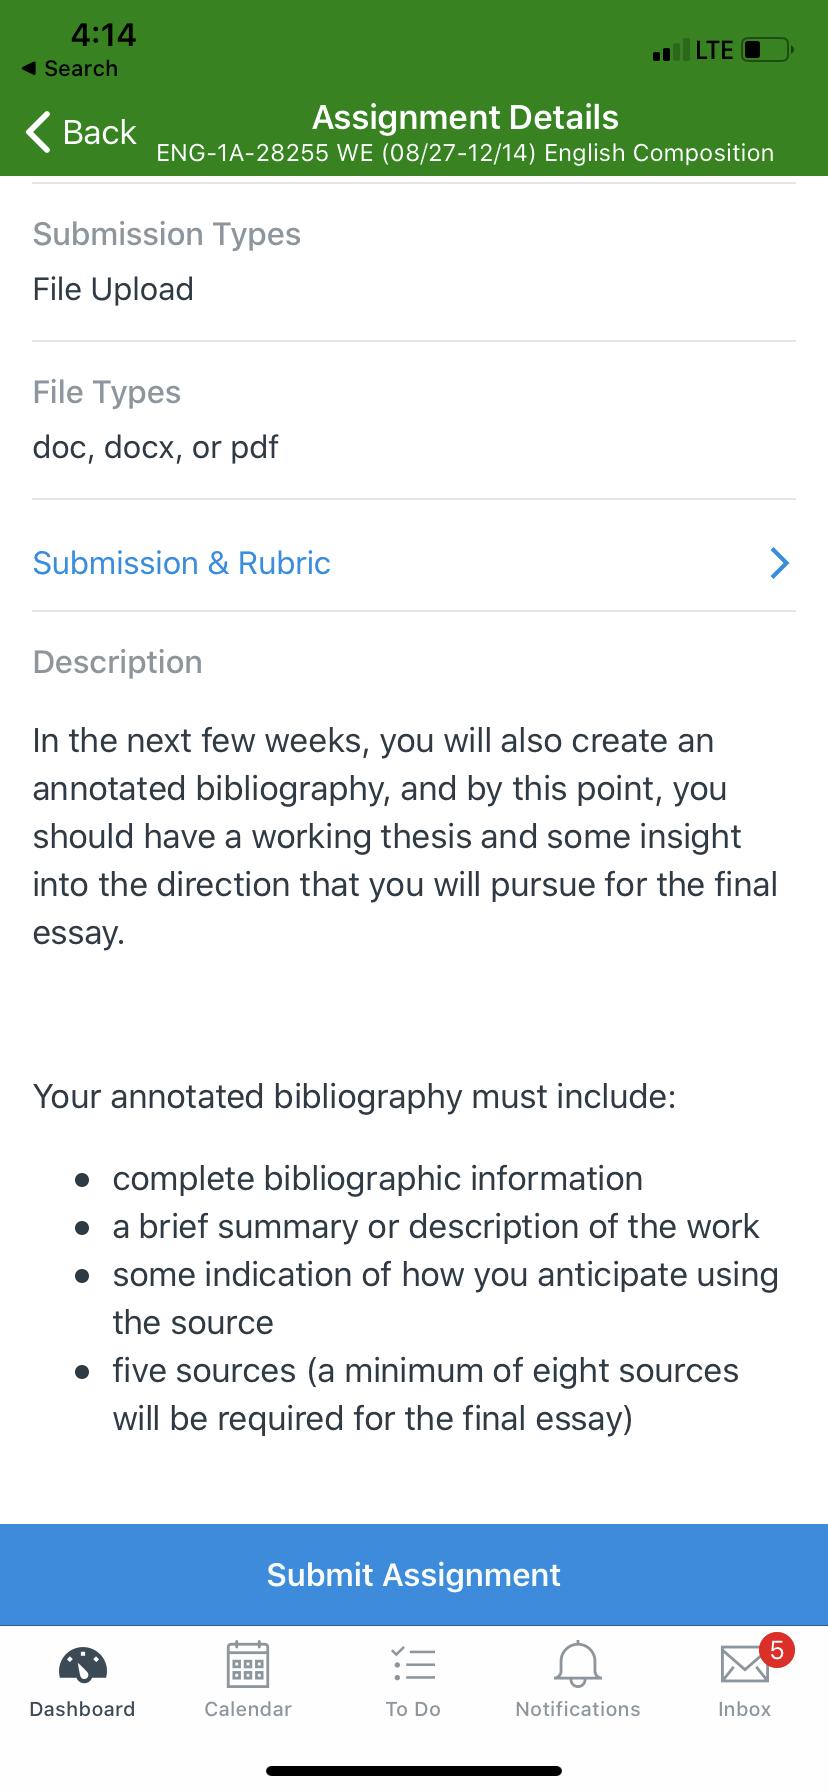 I need help with my essay